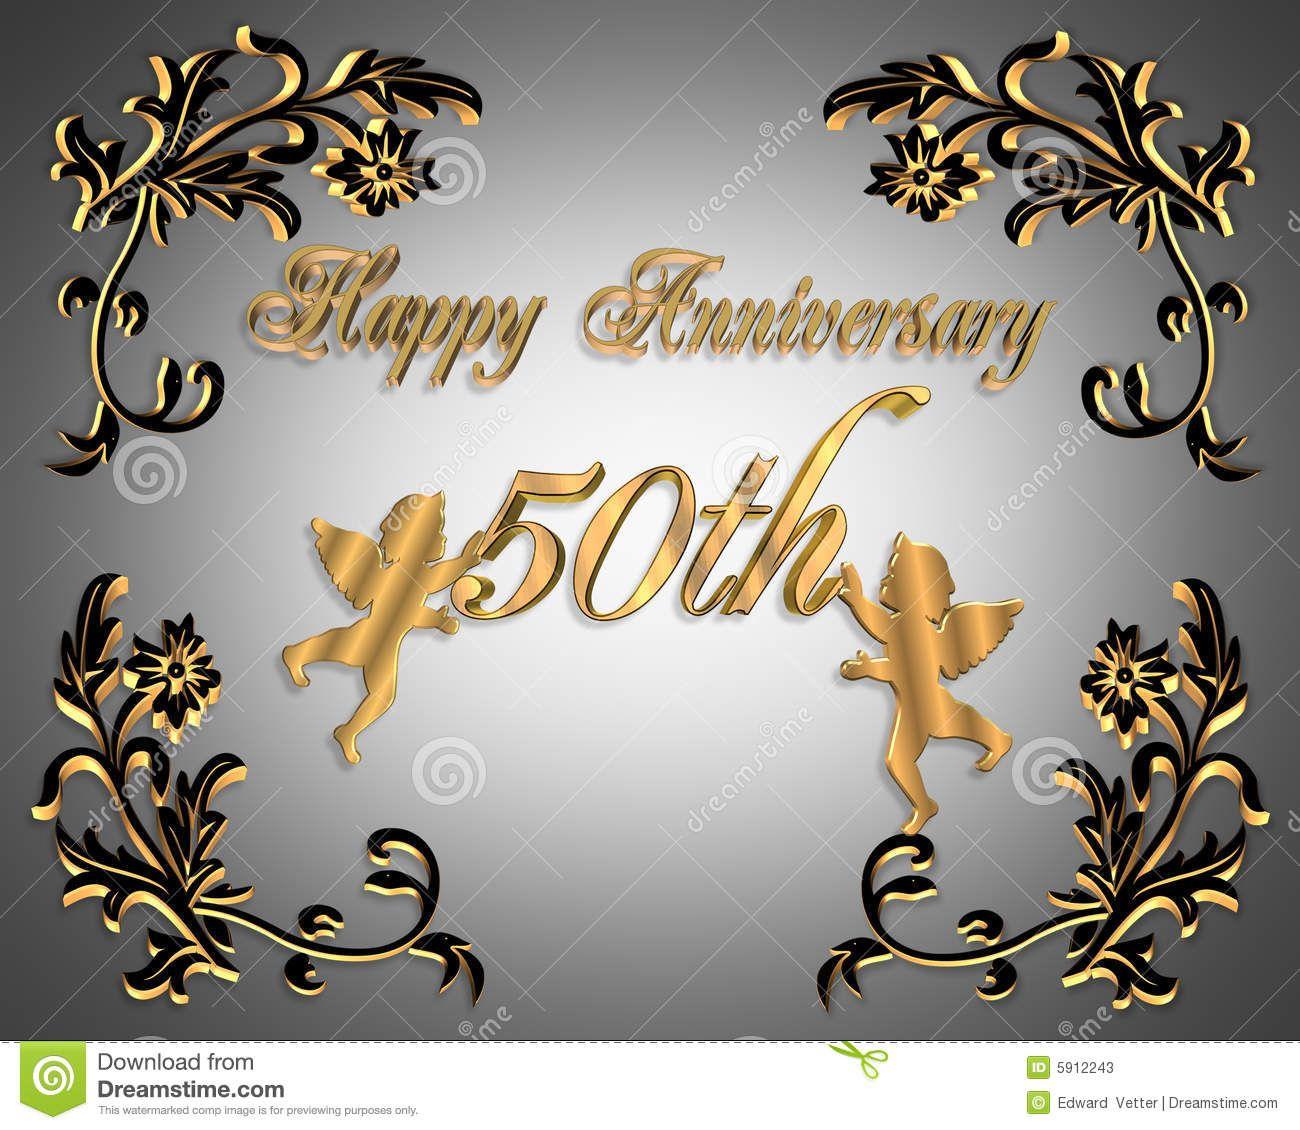 50th wedding anniversary bomboniere ideas   wedding-premium.com ...